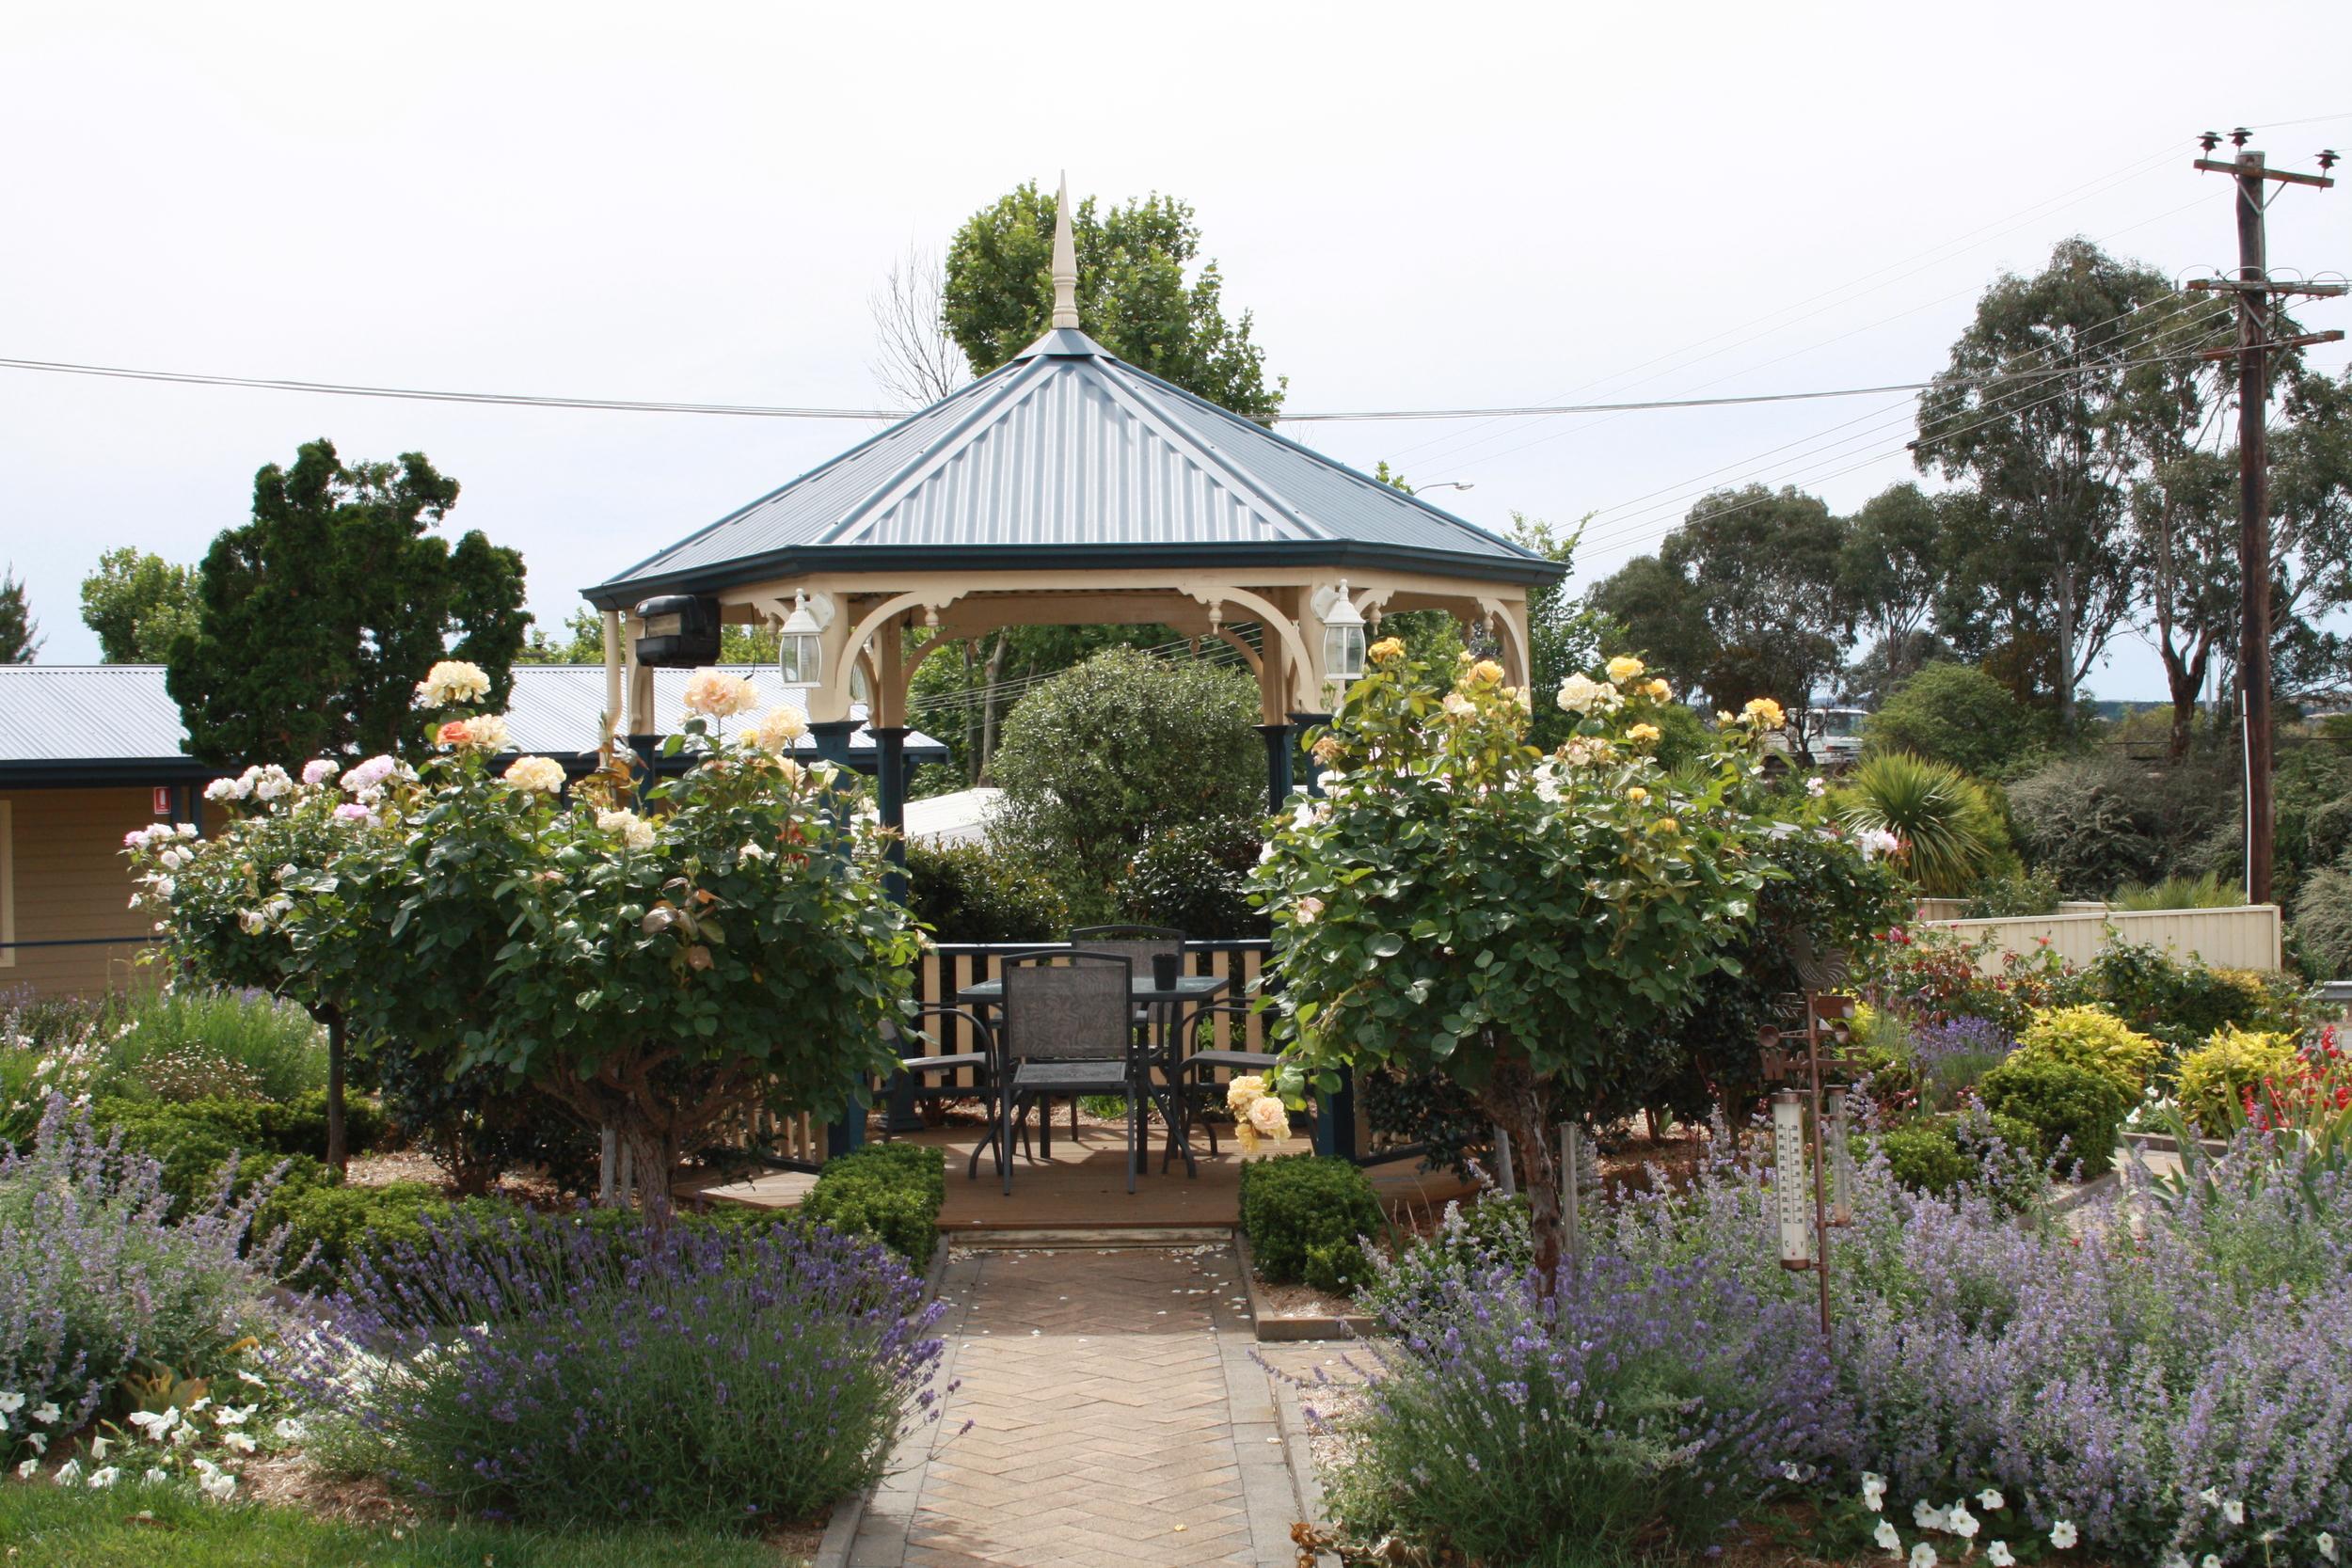 Andrew_Economos_Custom_Builder_Bowral_NSW_Australia_Country_Hotel_9.JPG